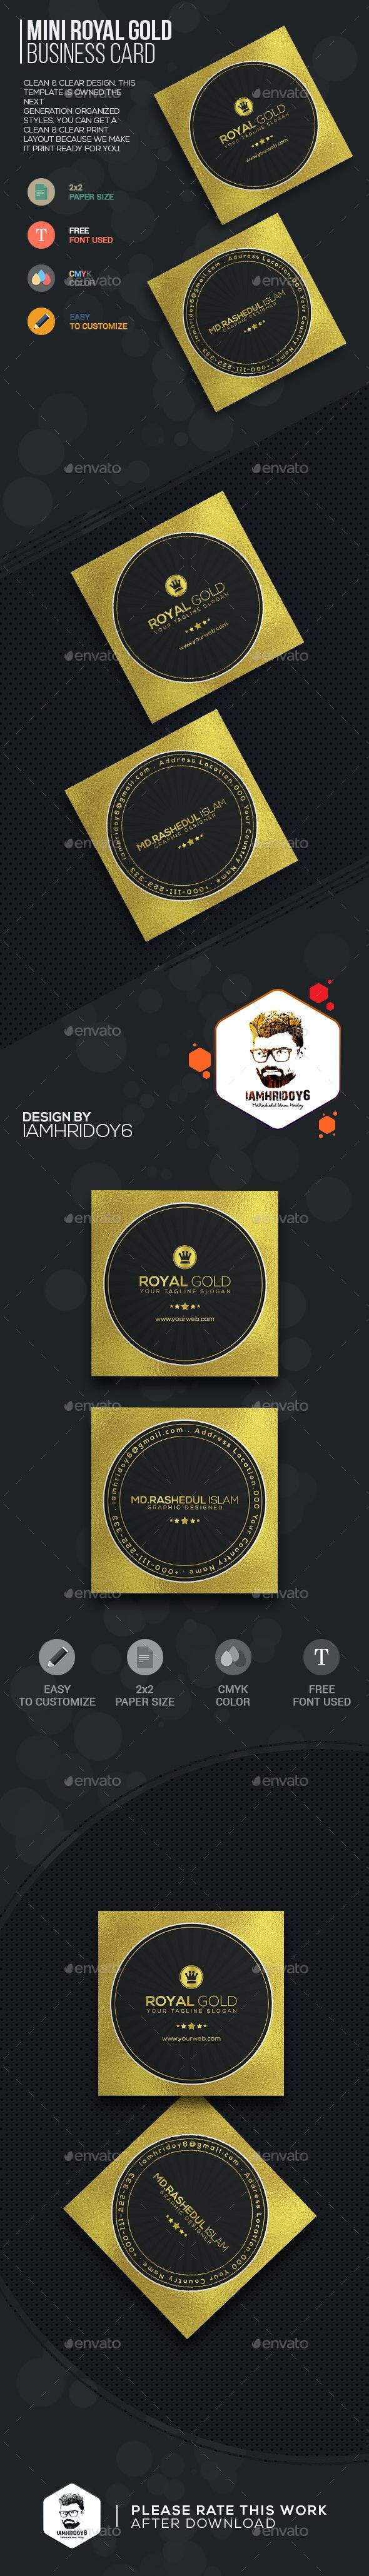 Mini Royal Gold Business Card - Business Cards Print Templates